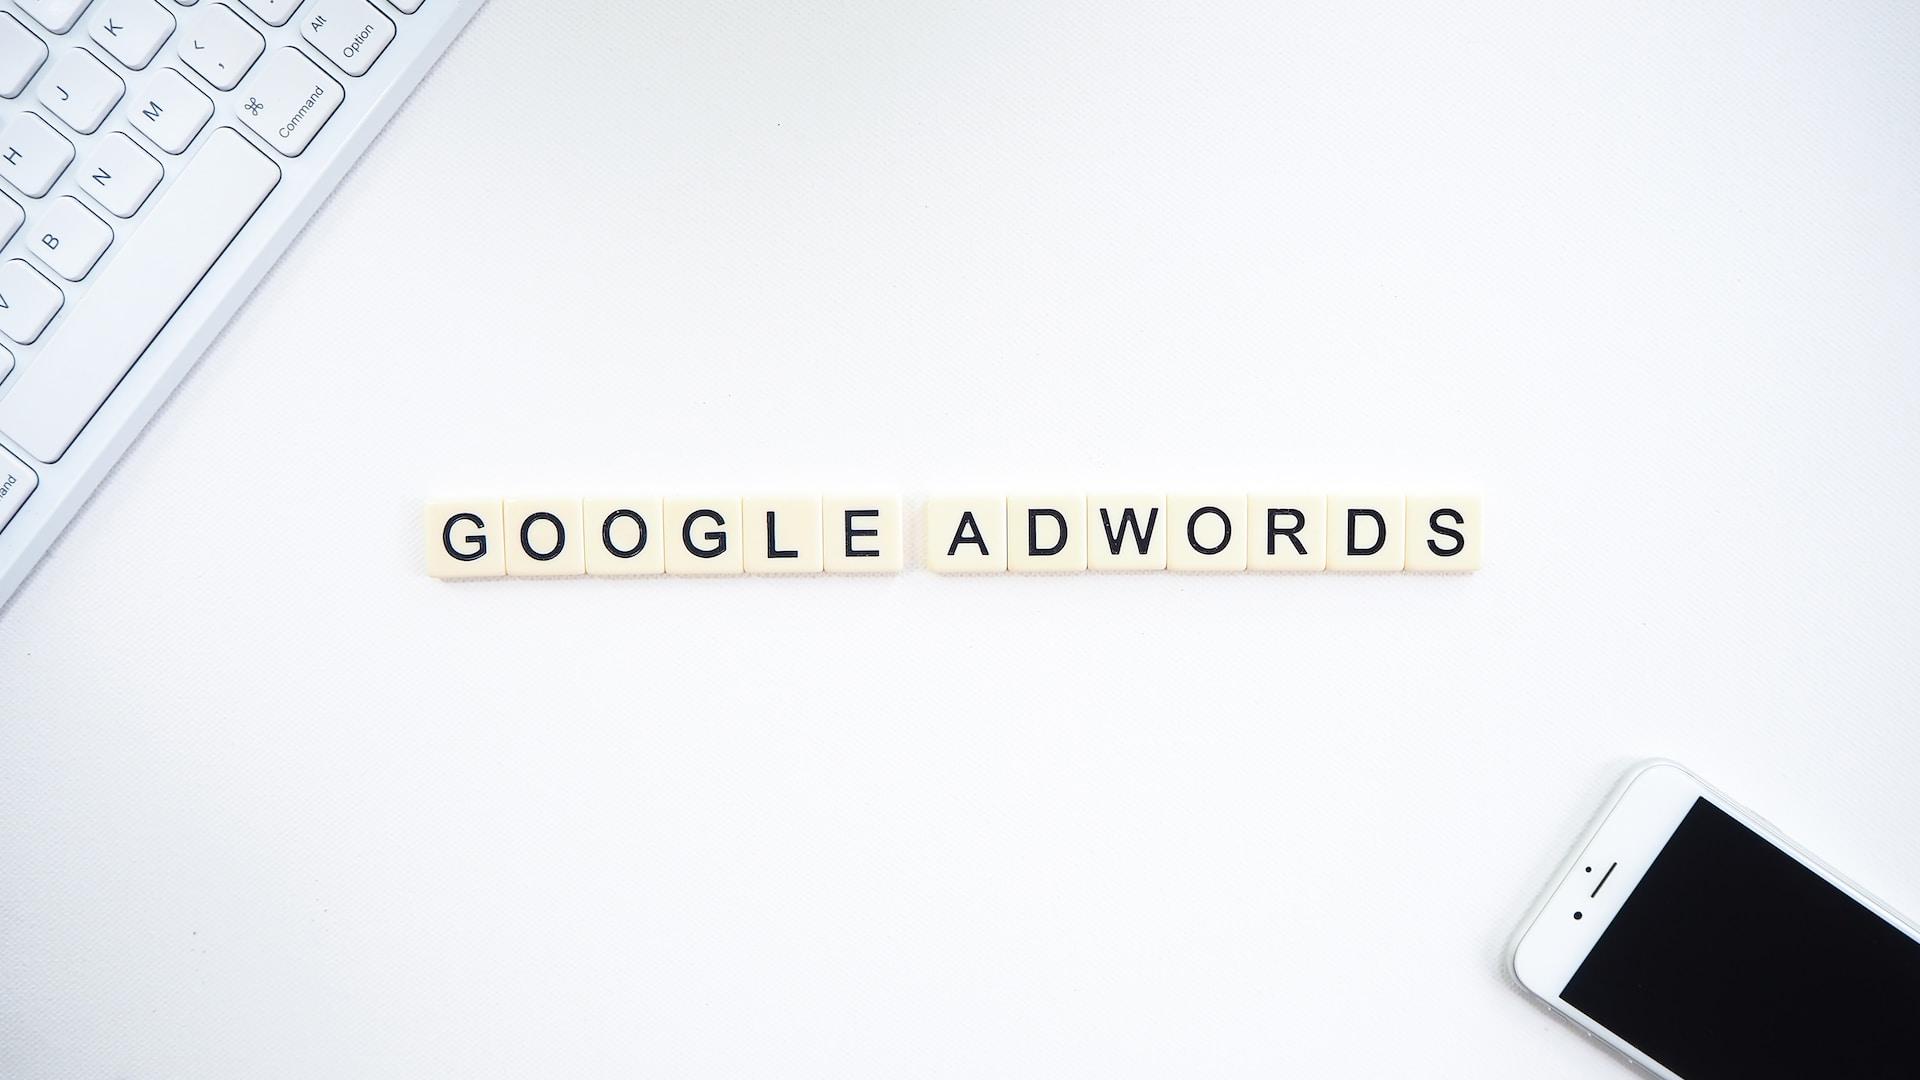 Google AdWords Search Engine Marketing